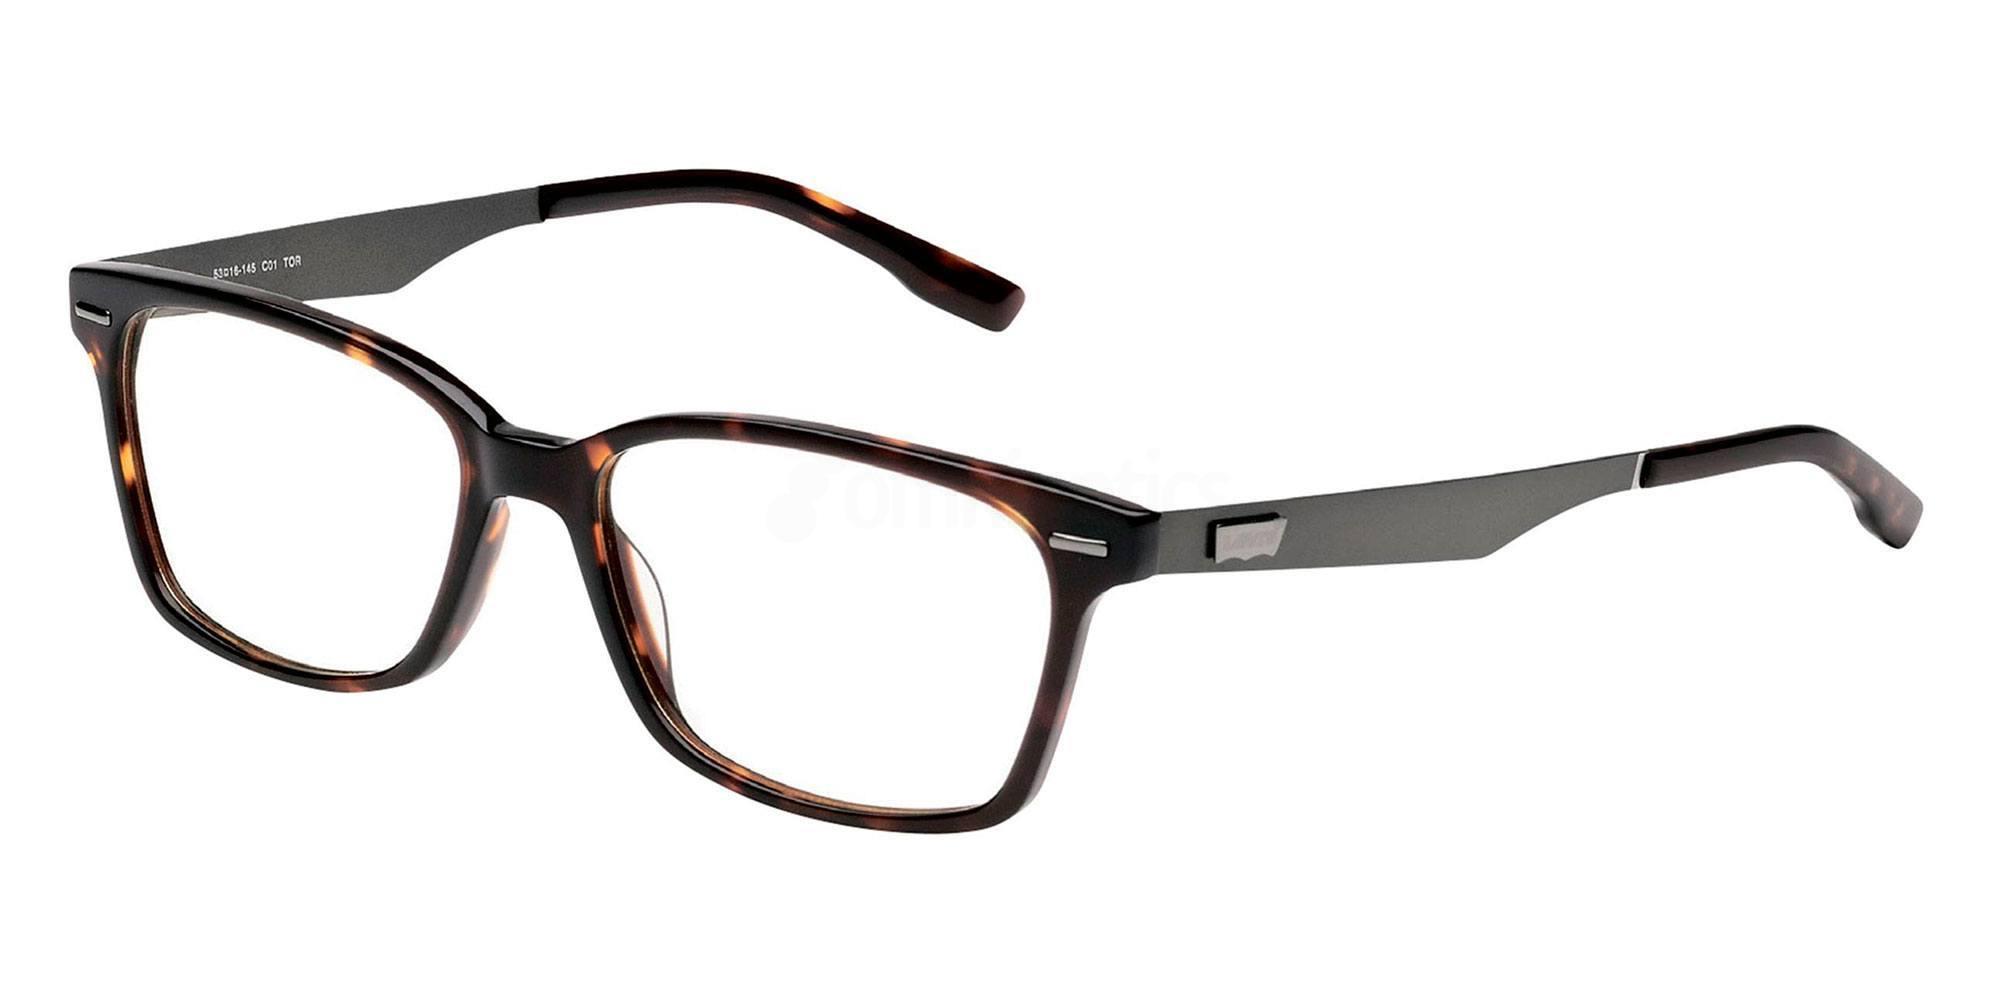 03 TOR LS117 , Levi's Eyewear